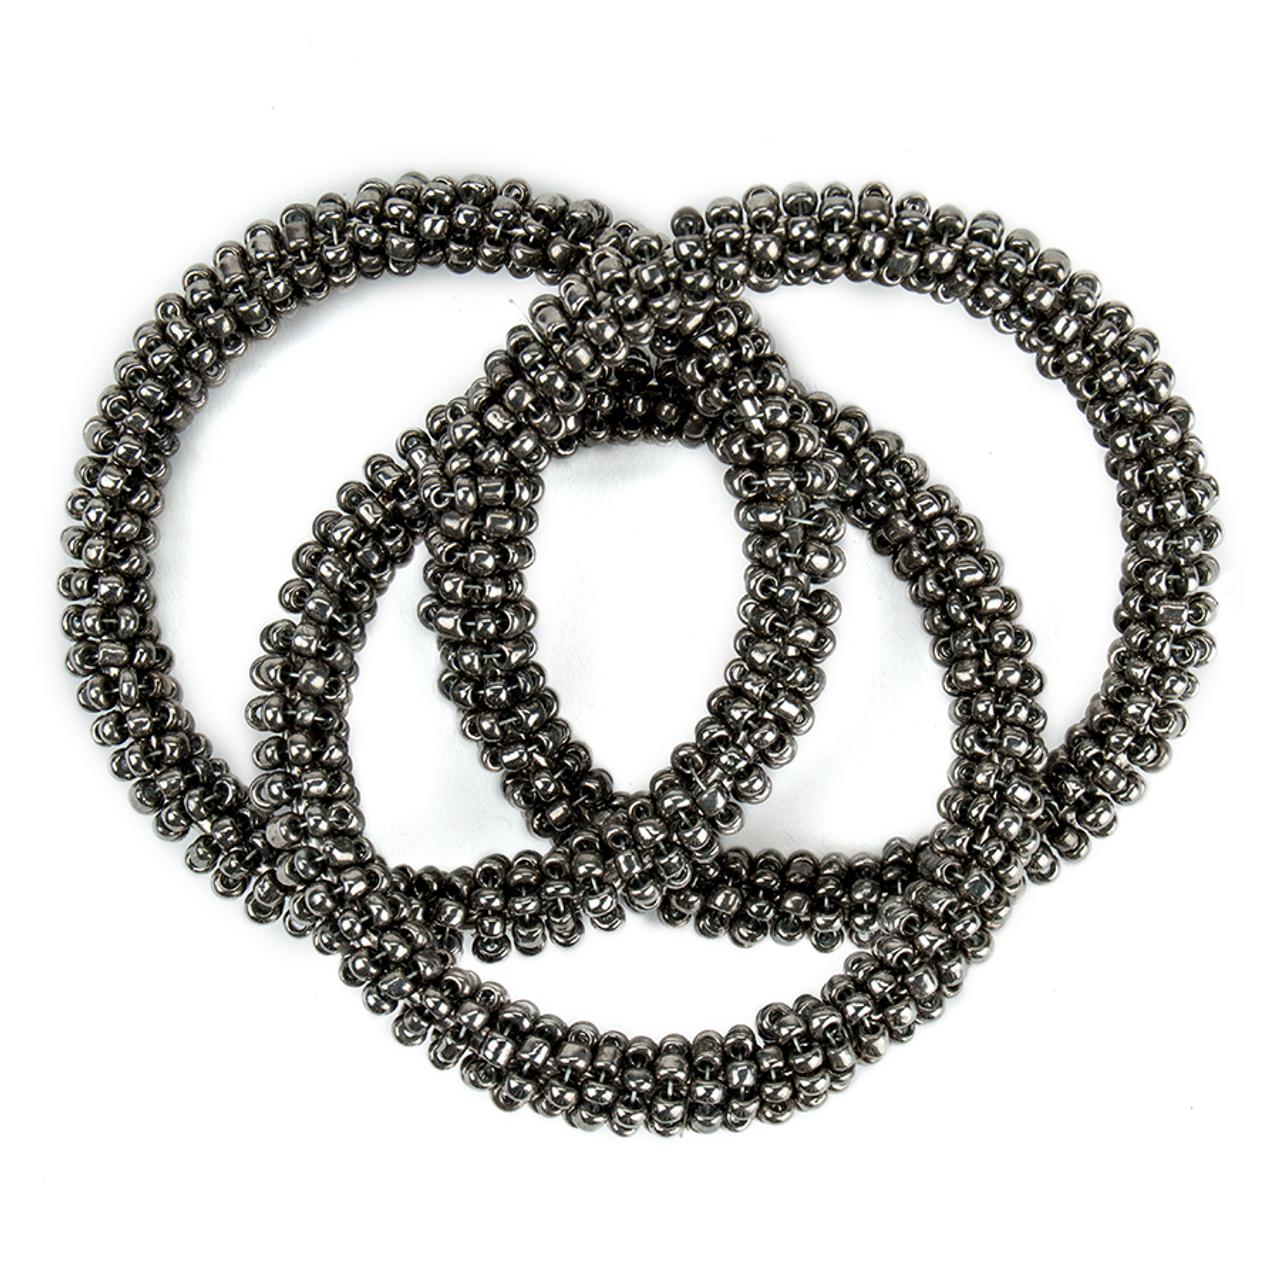 3 Ring Beaded Napkin Ring Between The Sheets